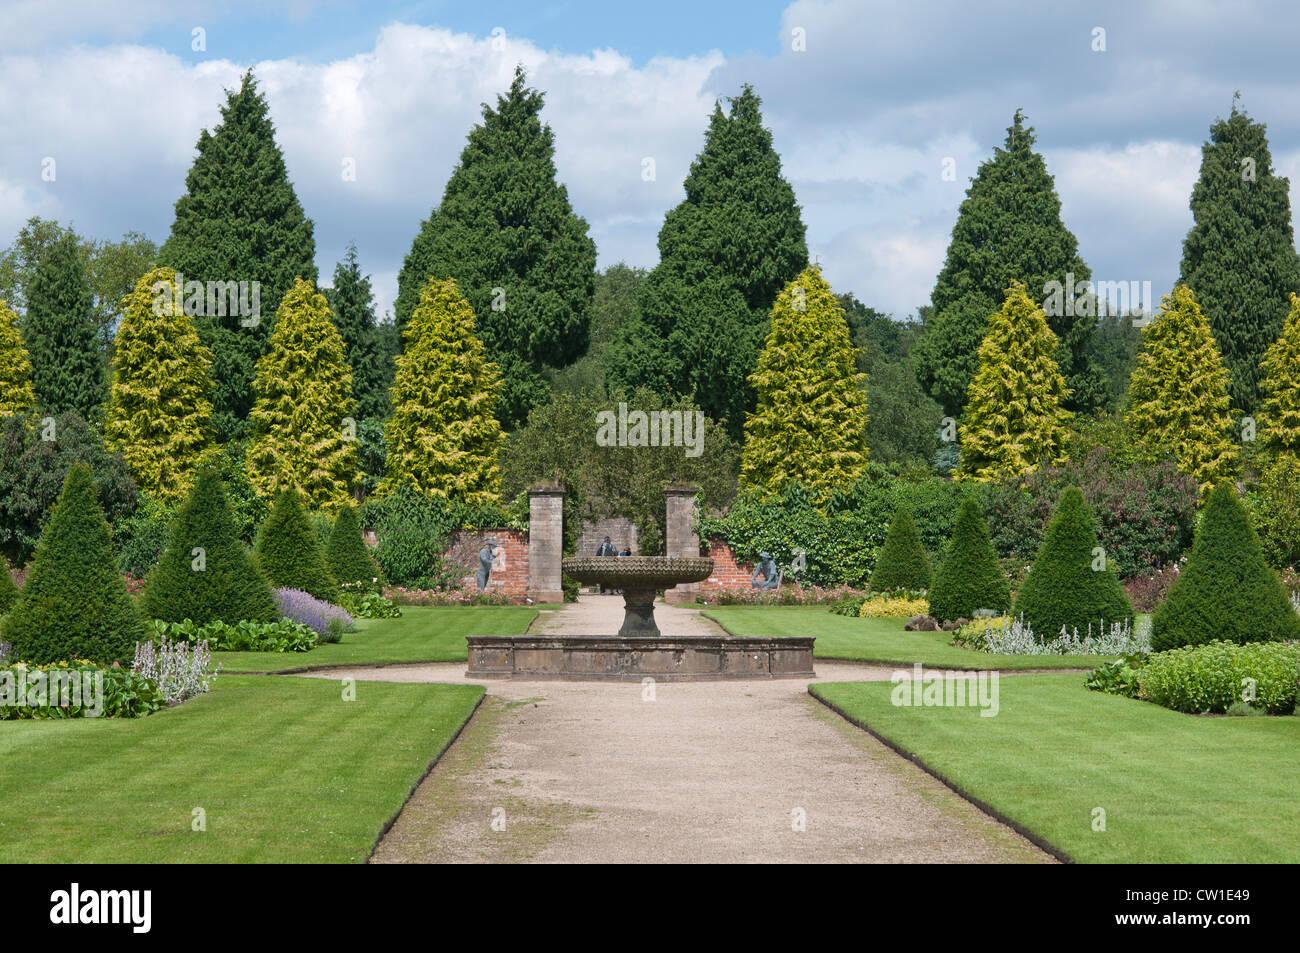 Formal Gardens at Newstead Abbey, Nottingham, England, UK - Stock Image